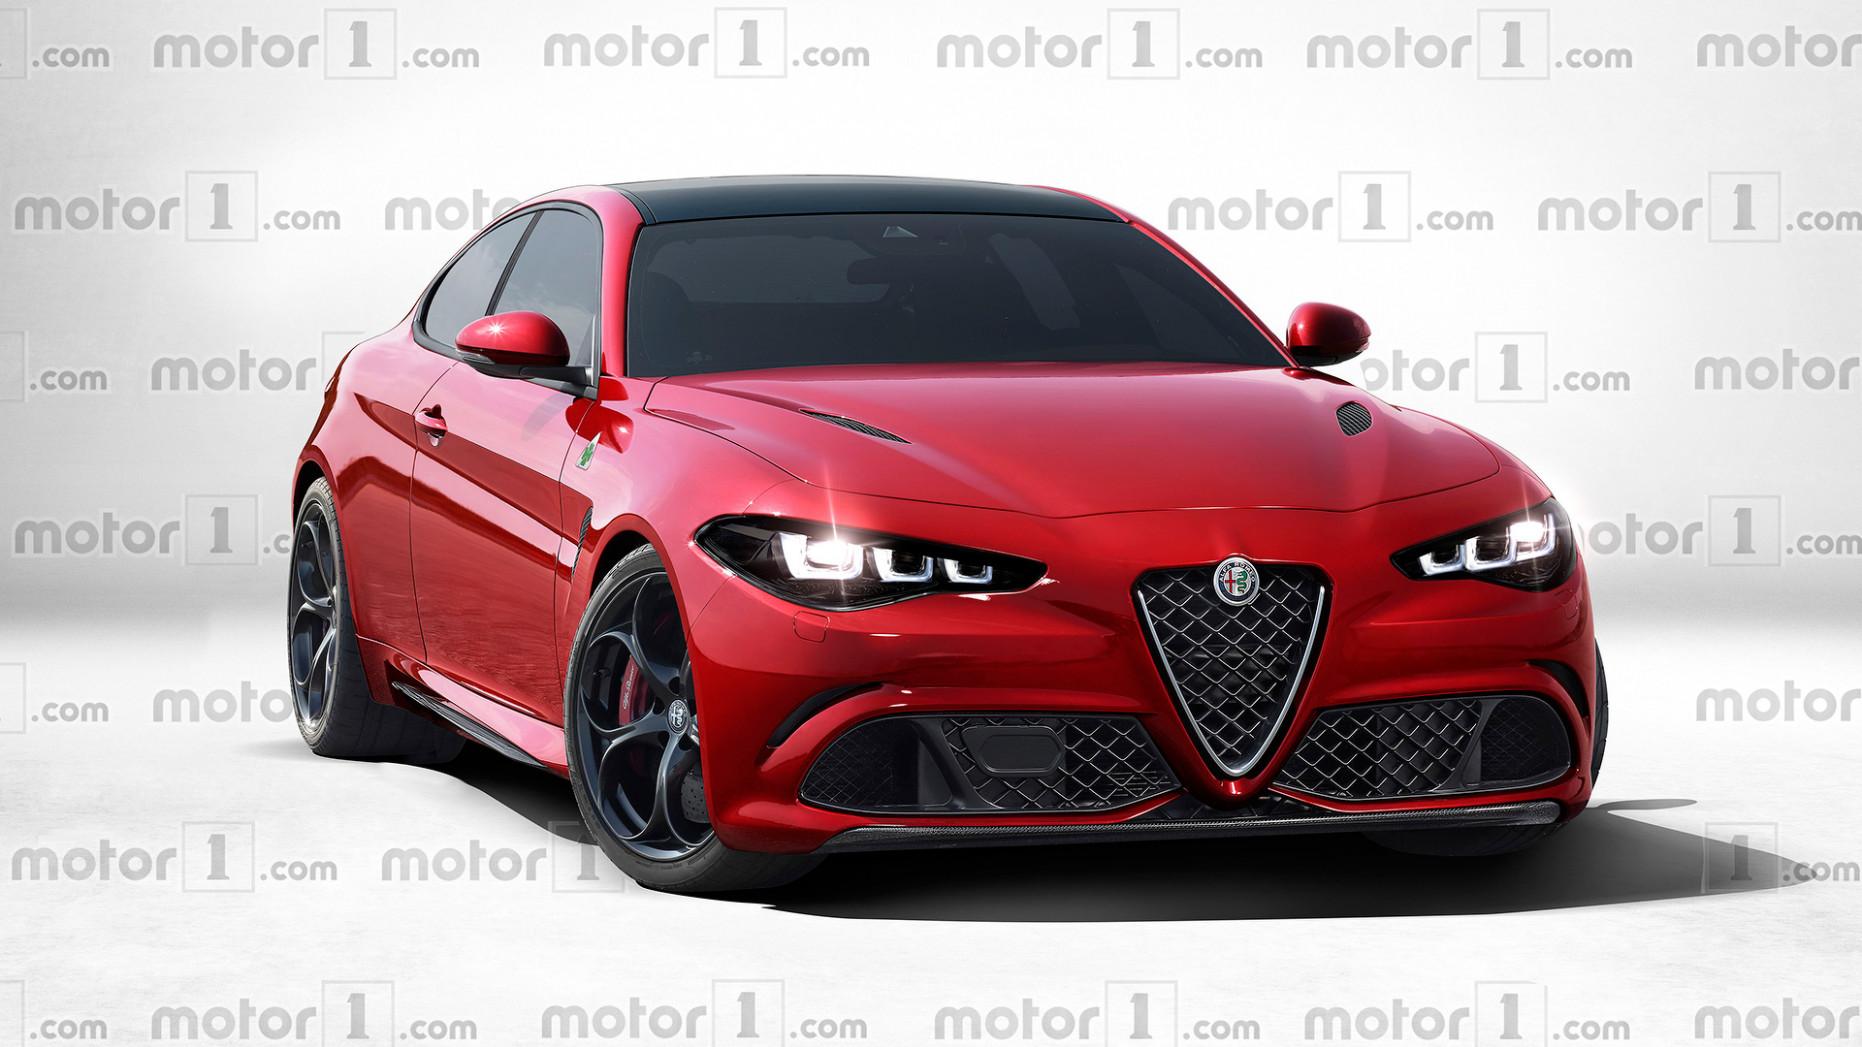 Prices 2022 Alfa Romeo Giulietta